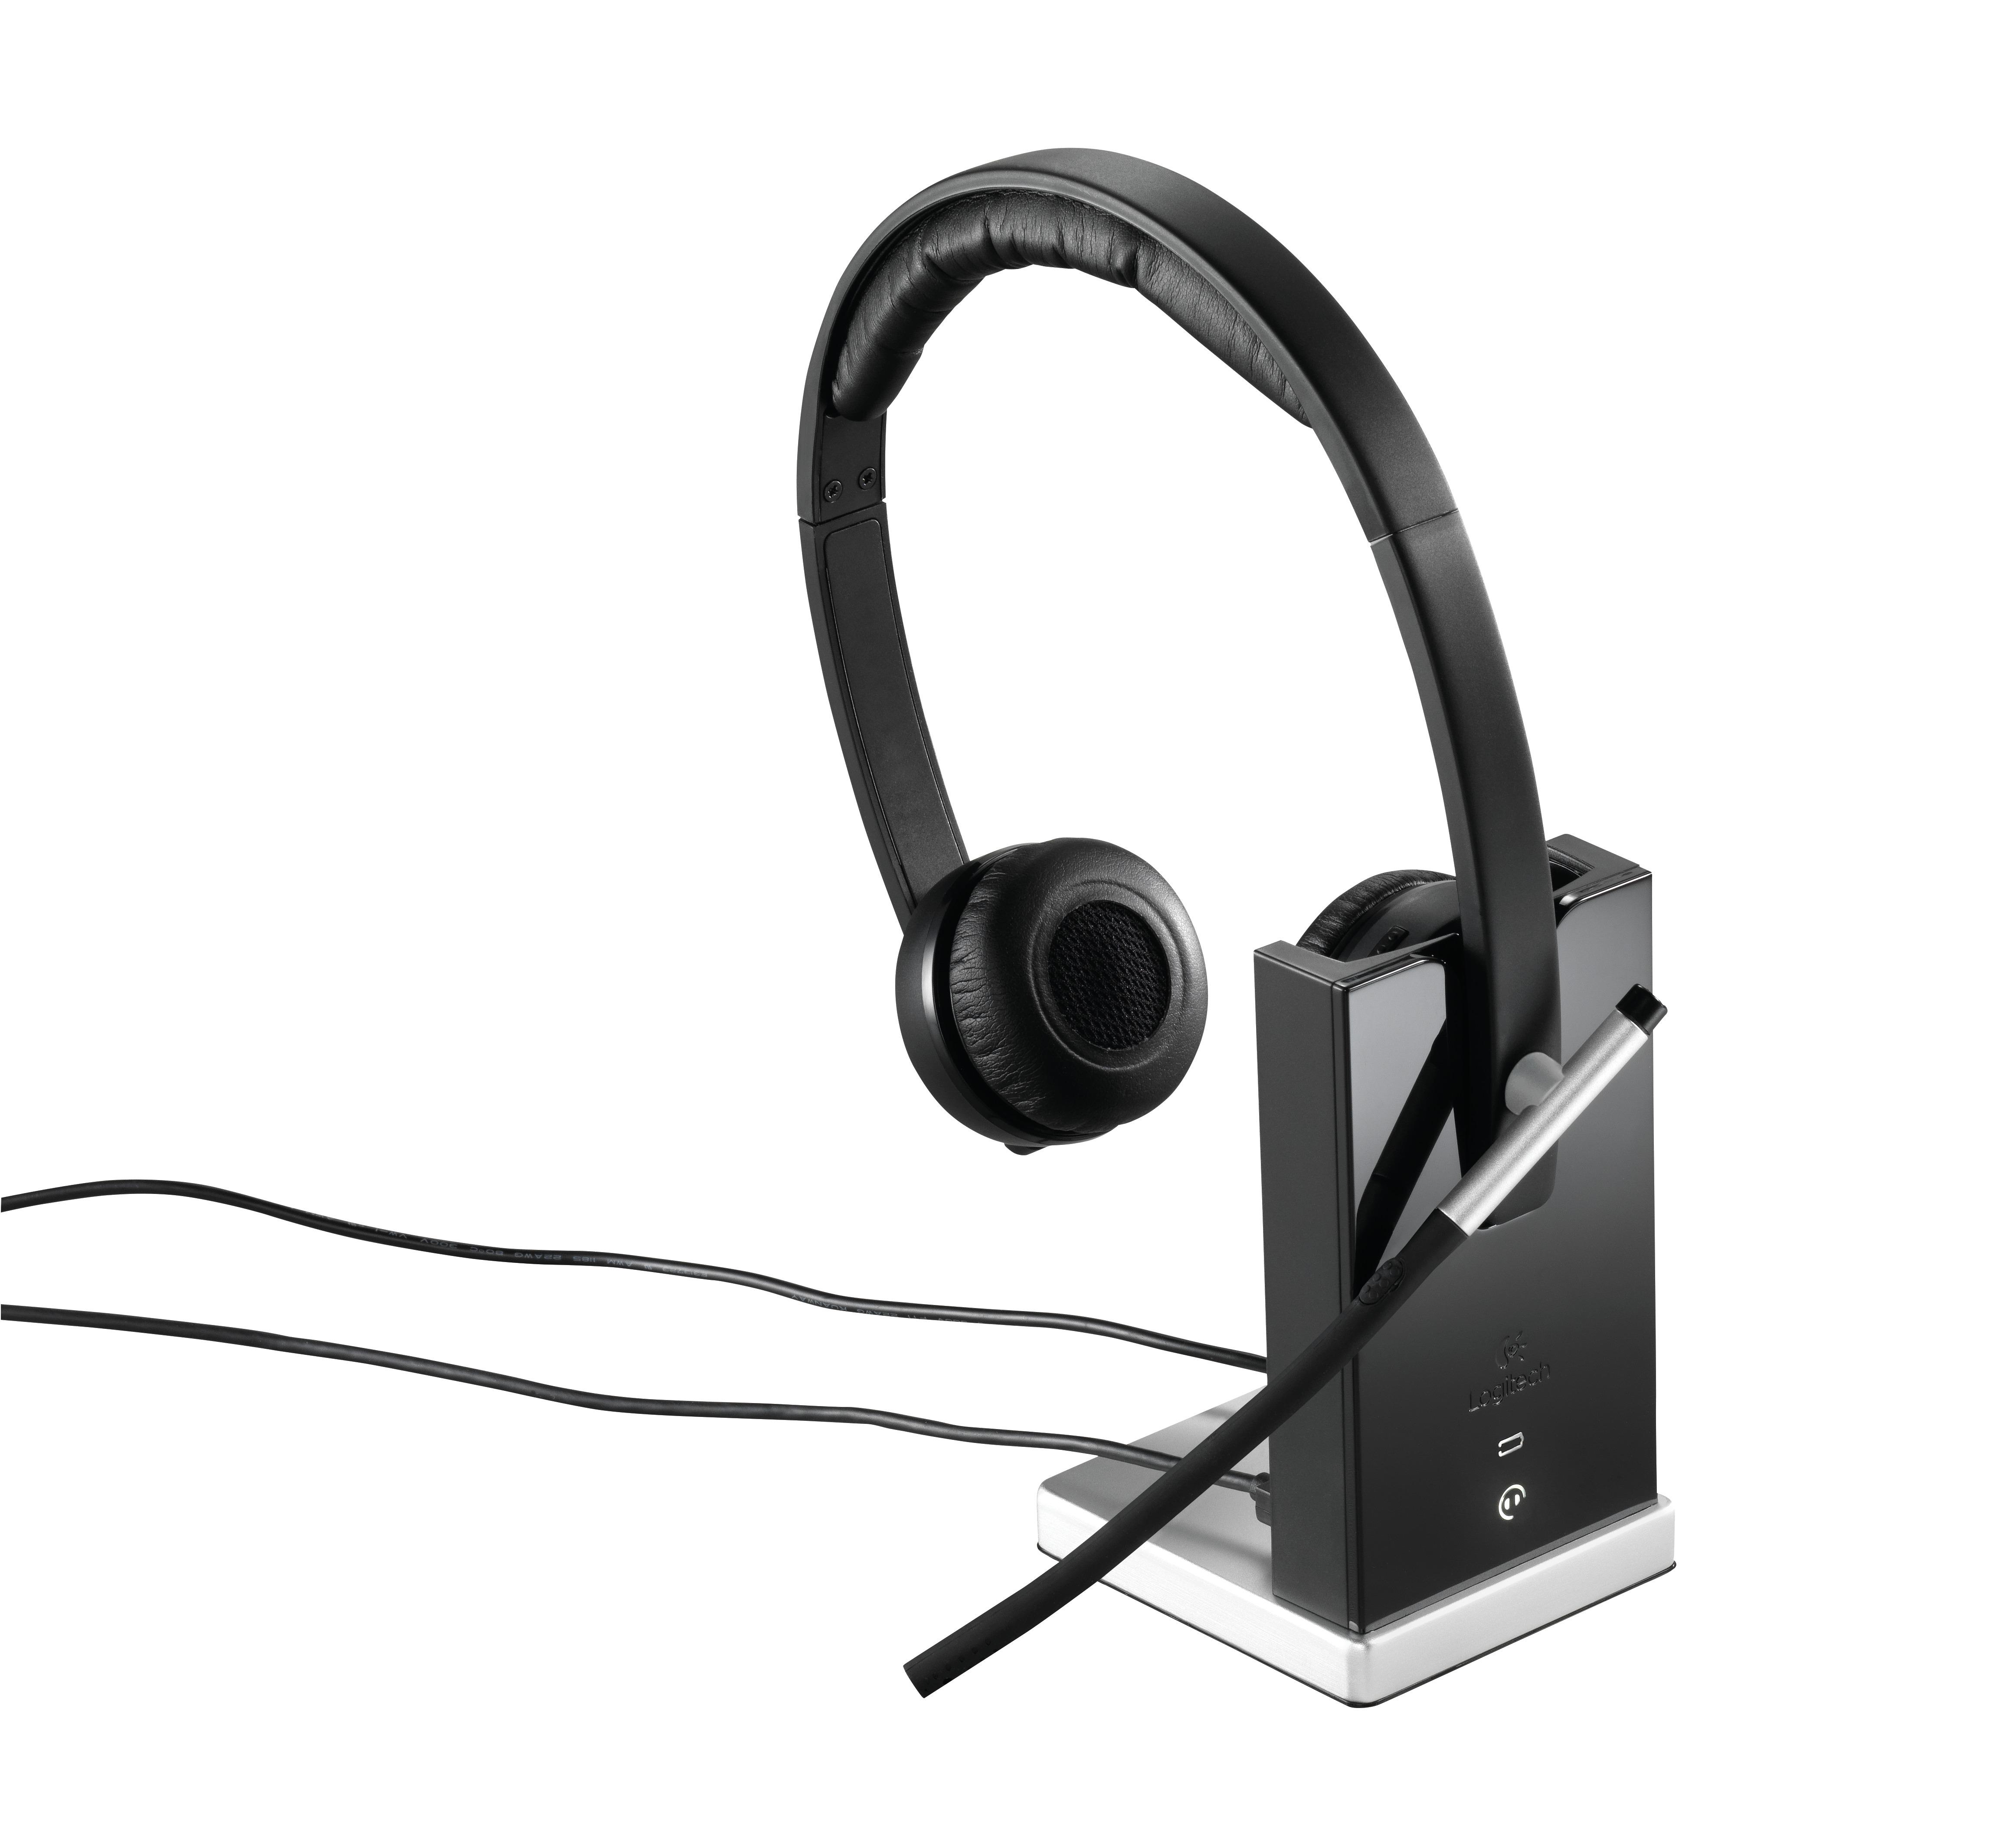 Top-Tier Wireless Office Headsets